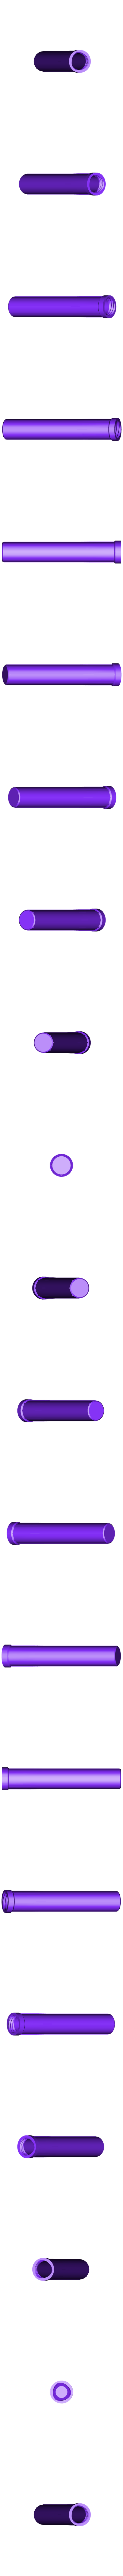 BatterySlot_Body_19.4mm.stl Download free STL file Bike Handlebar AA Battery Slot • 3D printable model, CyberCyclist